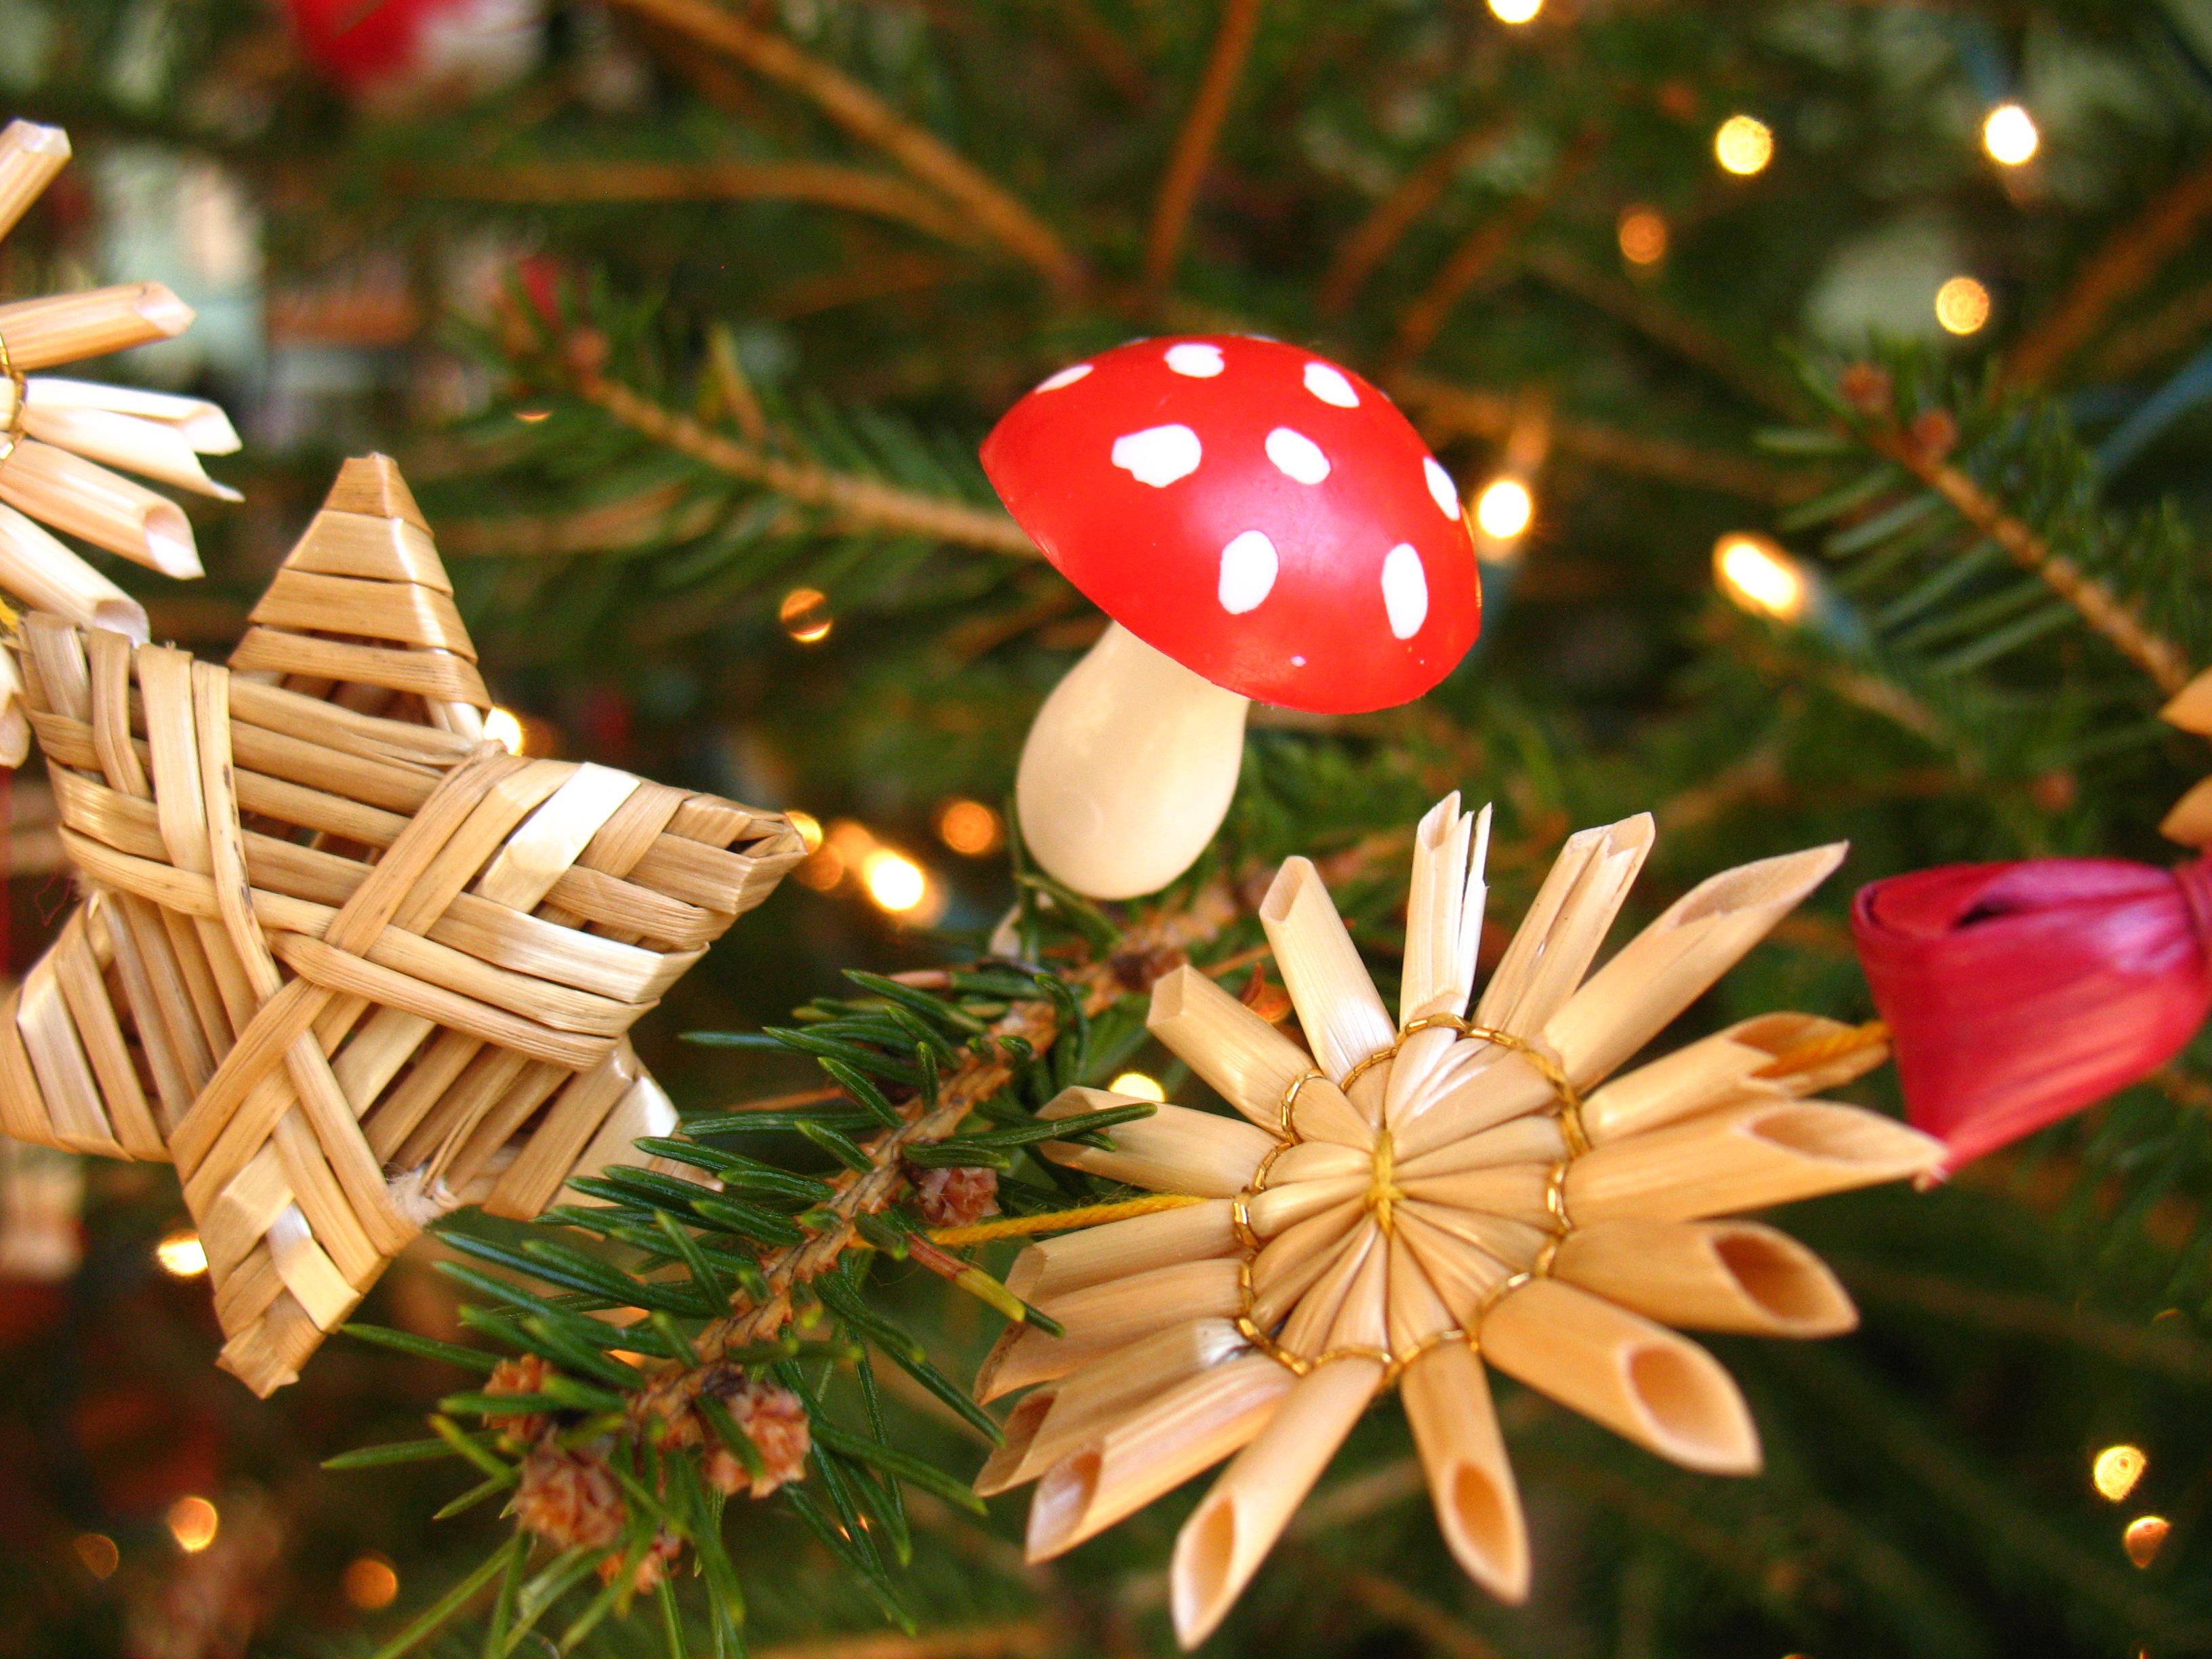 Swedish Christmas Tree Decorations